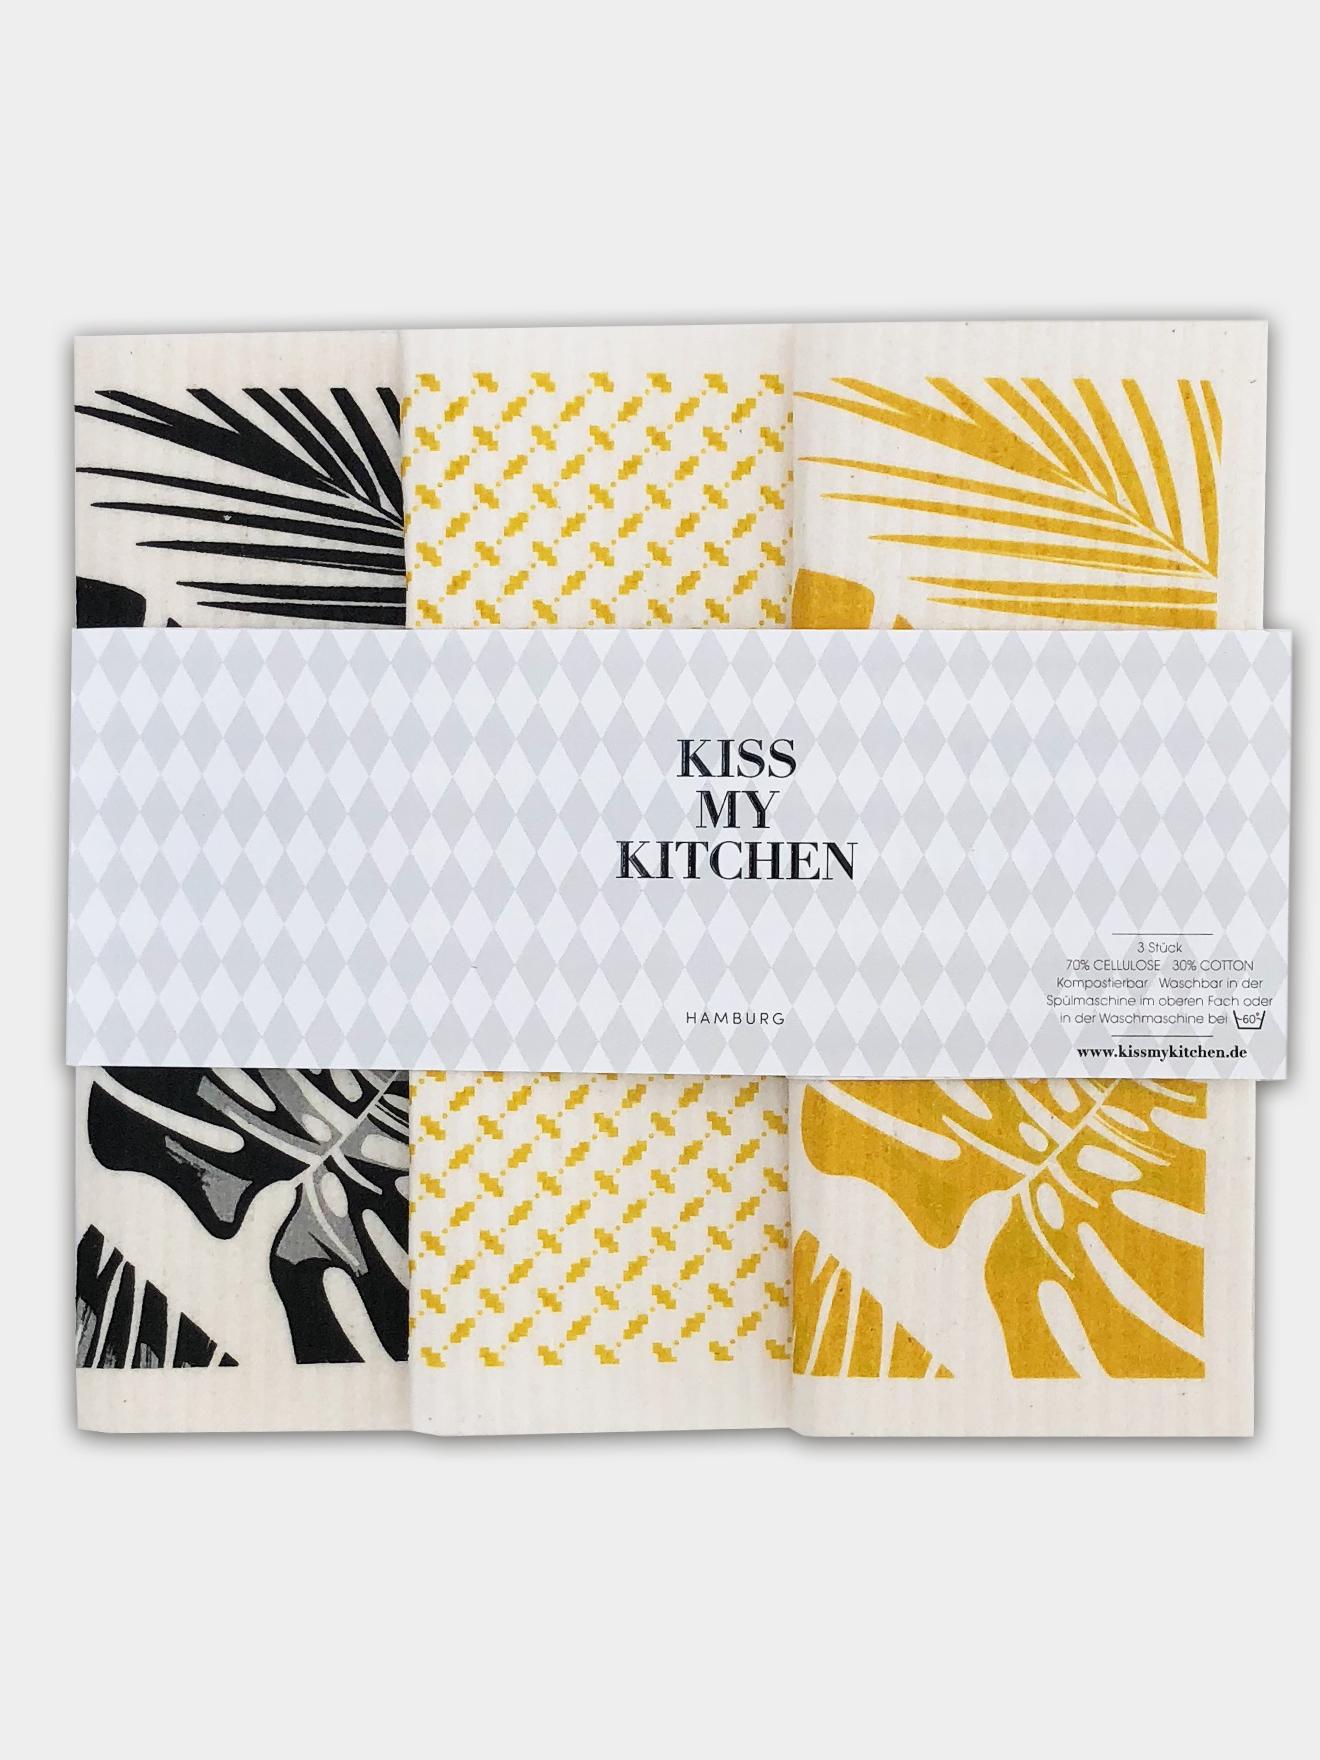 3 schwammt chermalibu kiss my kitchen. Black Bedroom Furniture Sets. Home Design Ideas